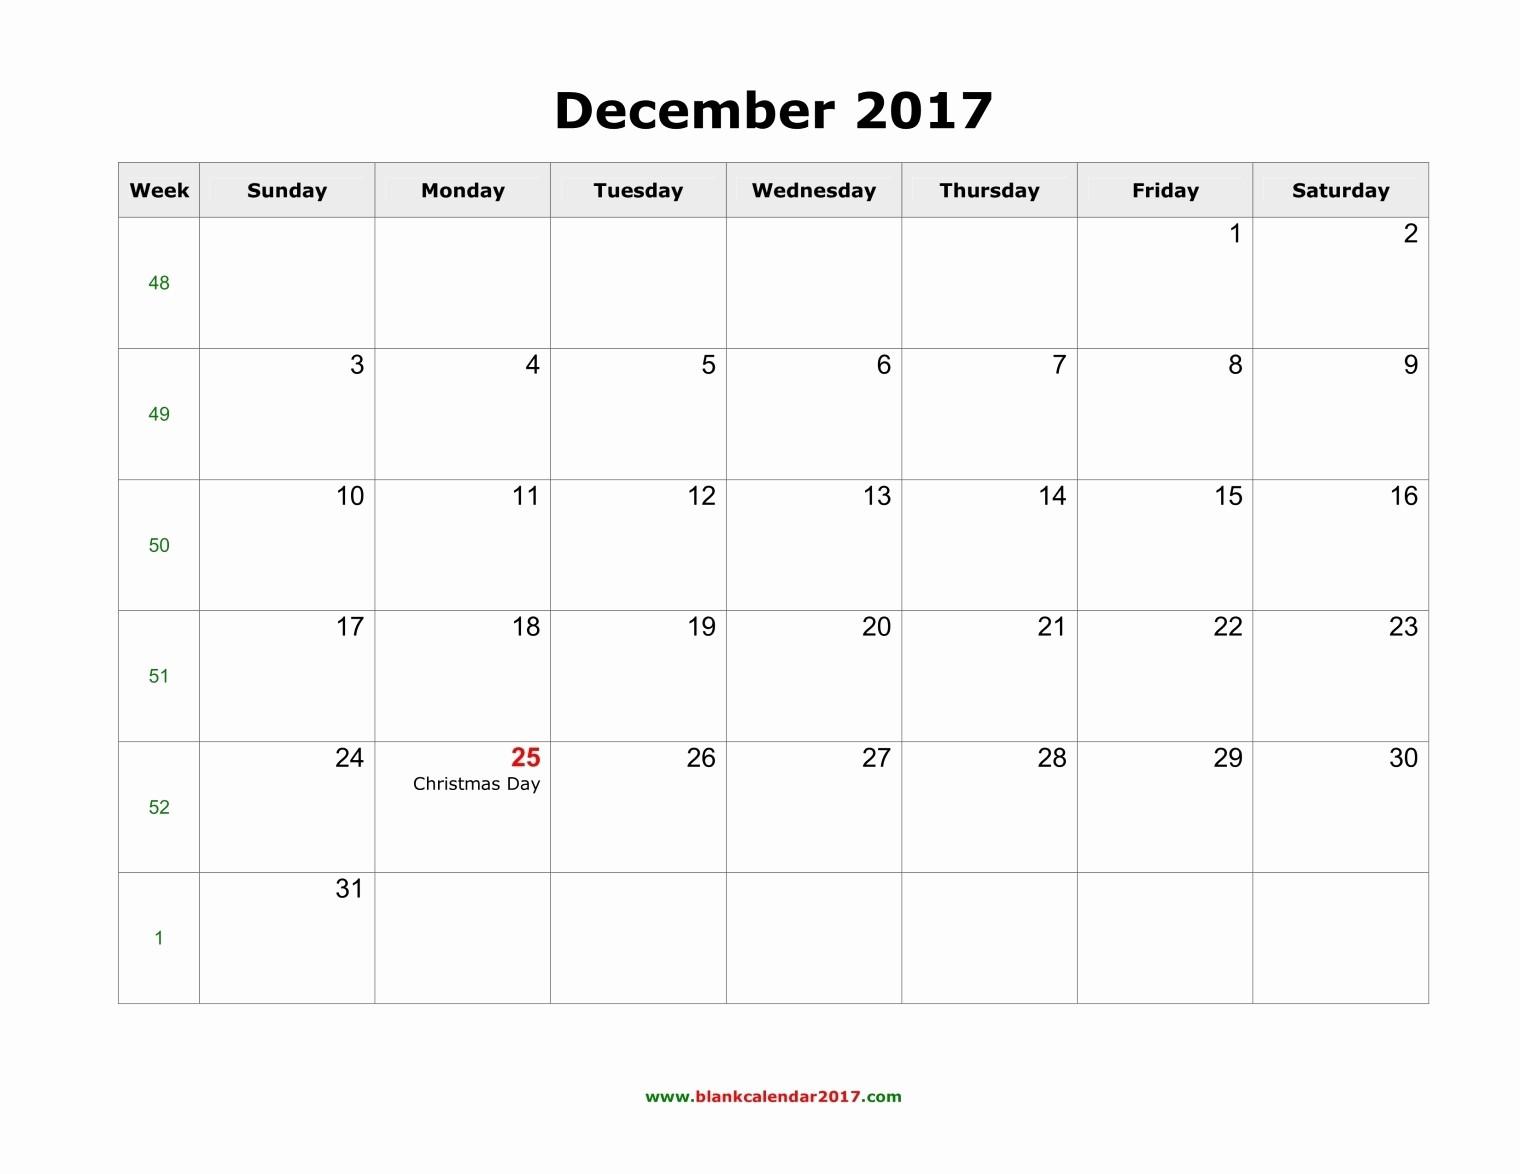 Free 2017 Printable Calendar Word Inspirational December 2017 Calendar Word